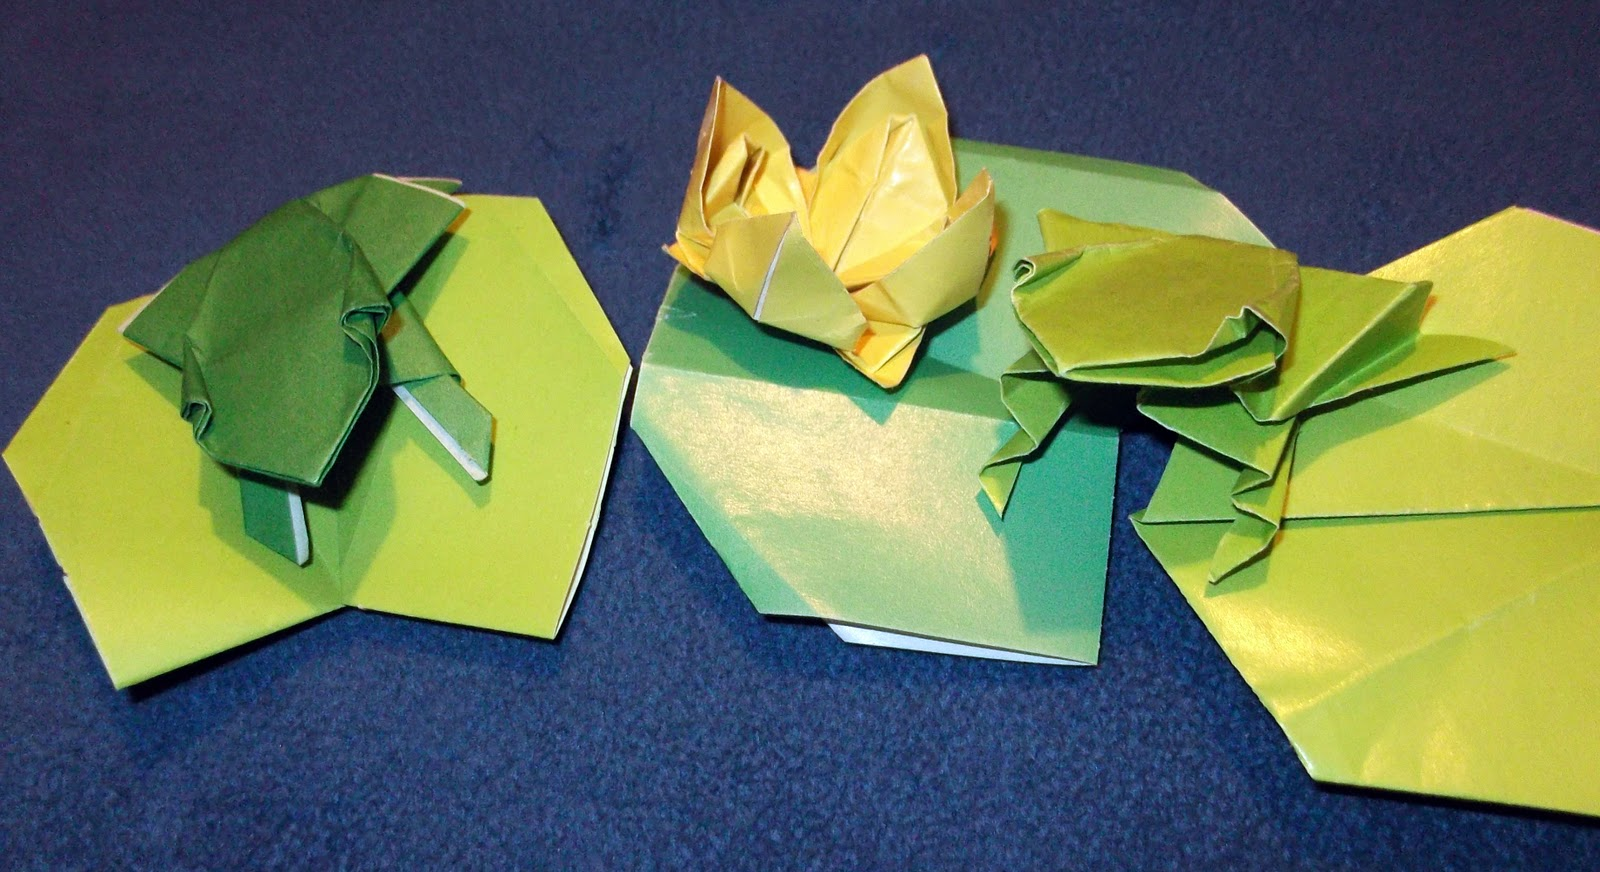 Origami Jumping Frog Diagram Fender Precision Wiring Library Rana Saltarina De